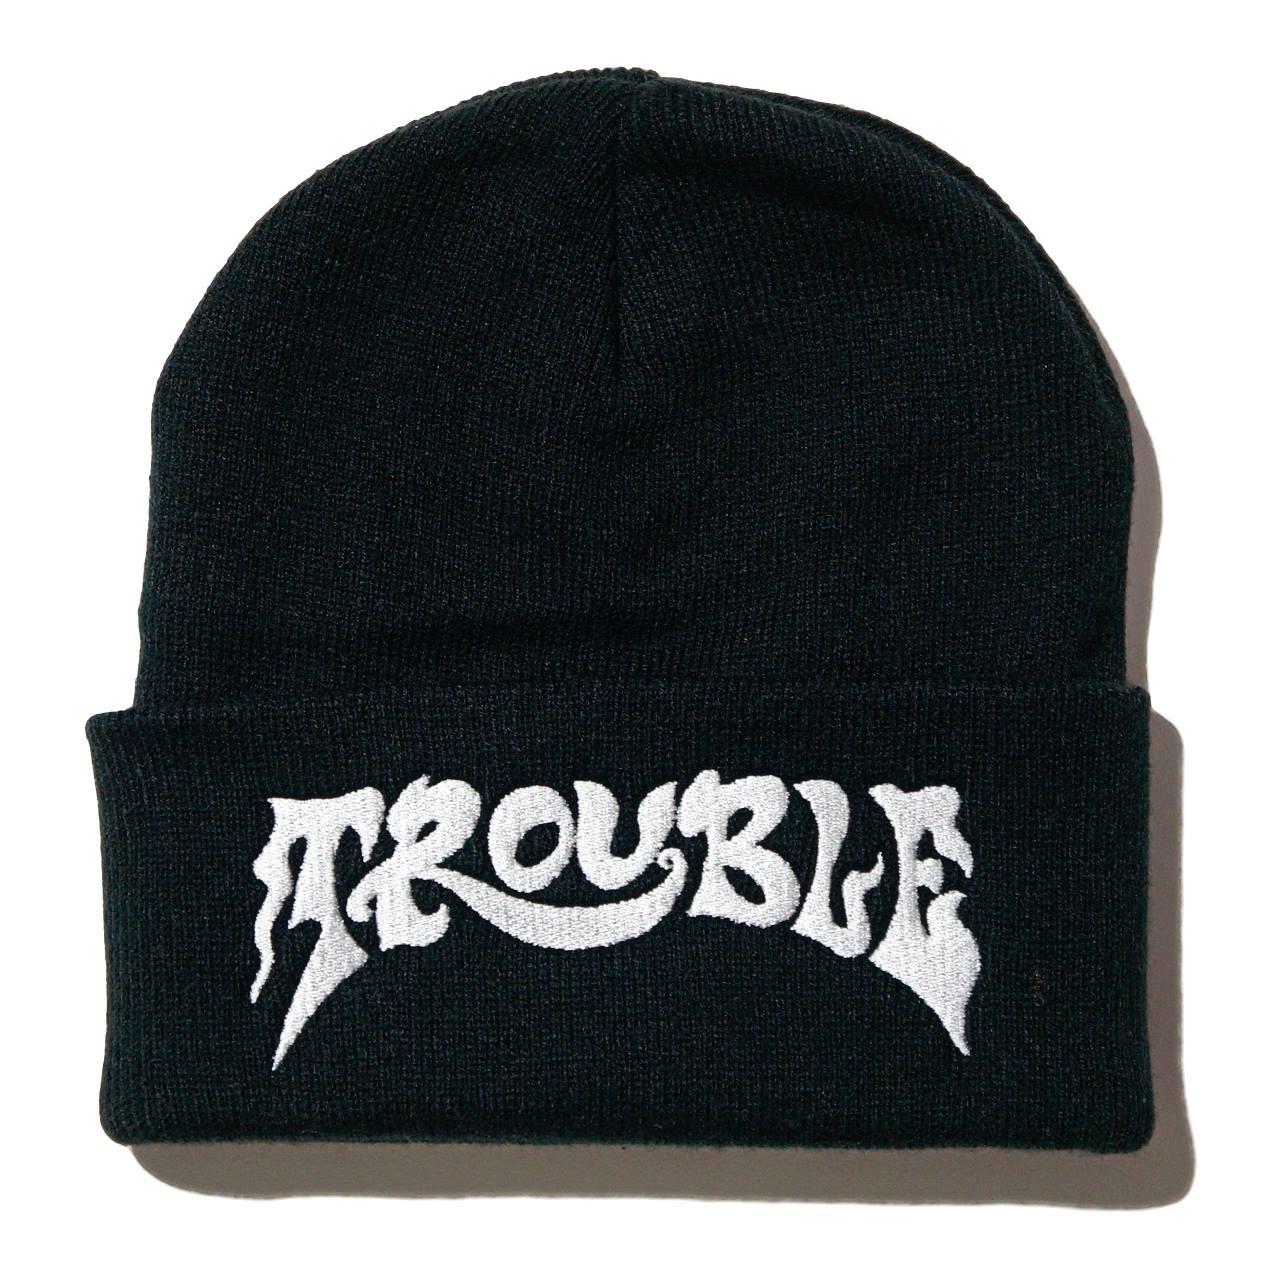 TROUBLE バンド ビーニー ニットキャップ Logo